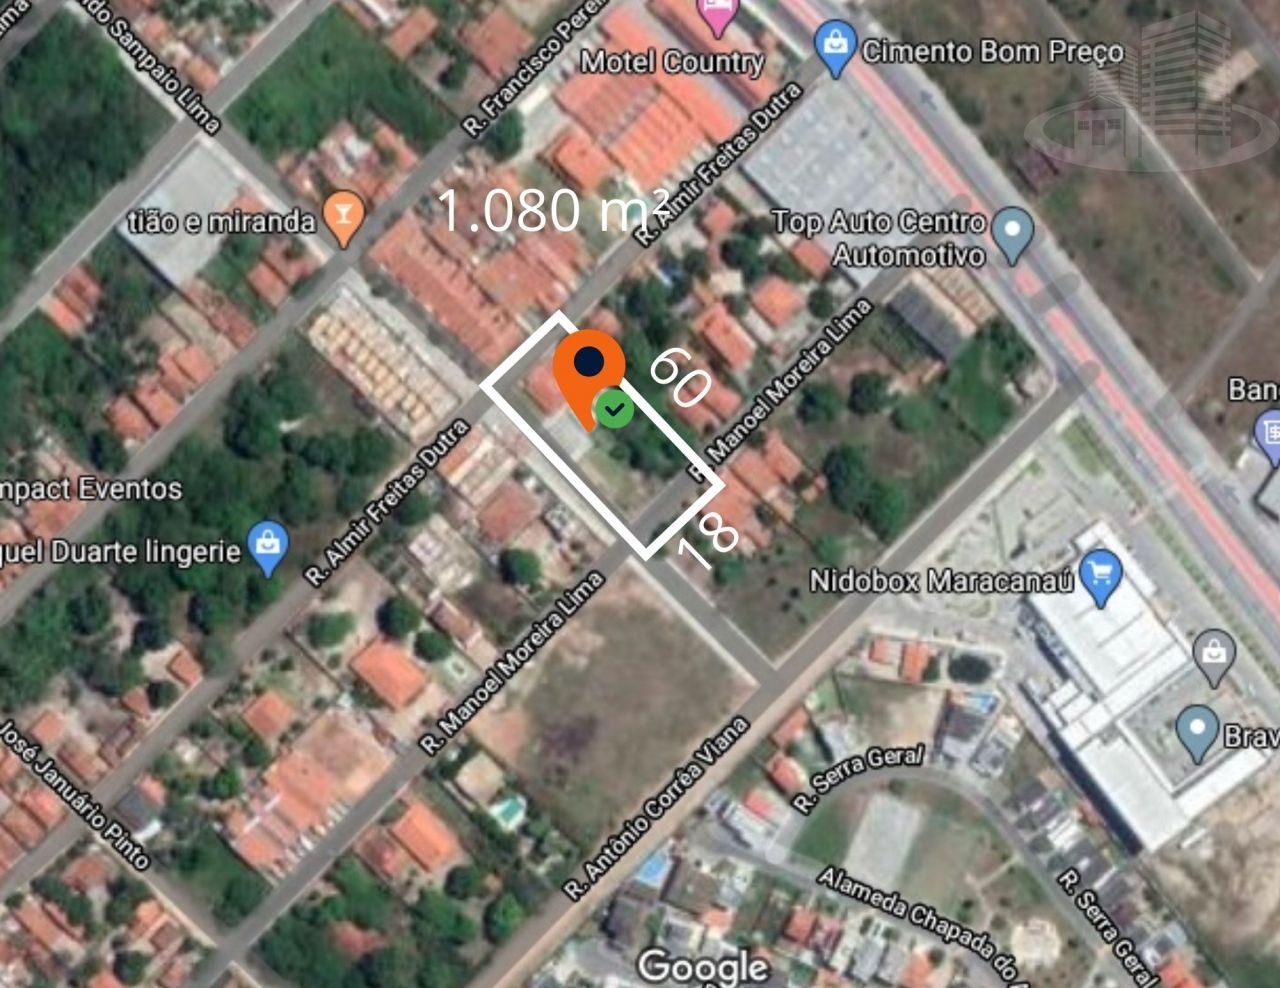 Terreno/Lote à venda  no Luzardo Viana - Maracanaú, CE. Imóveis